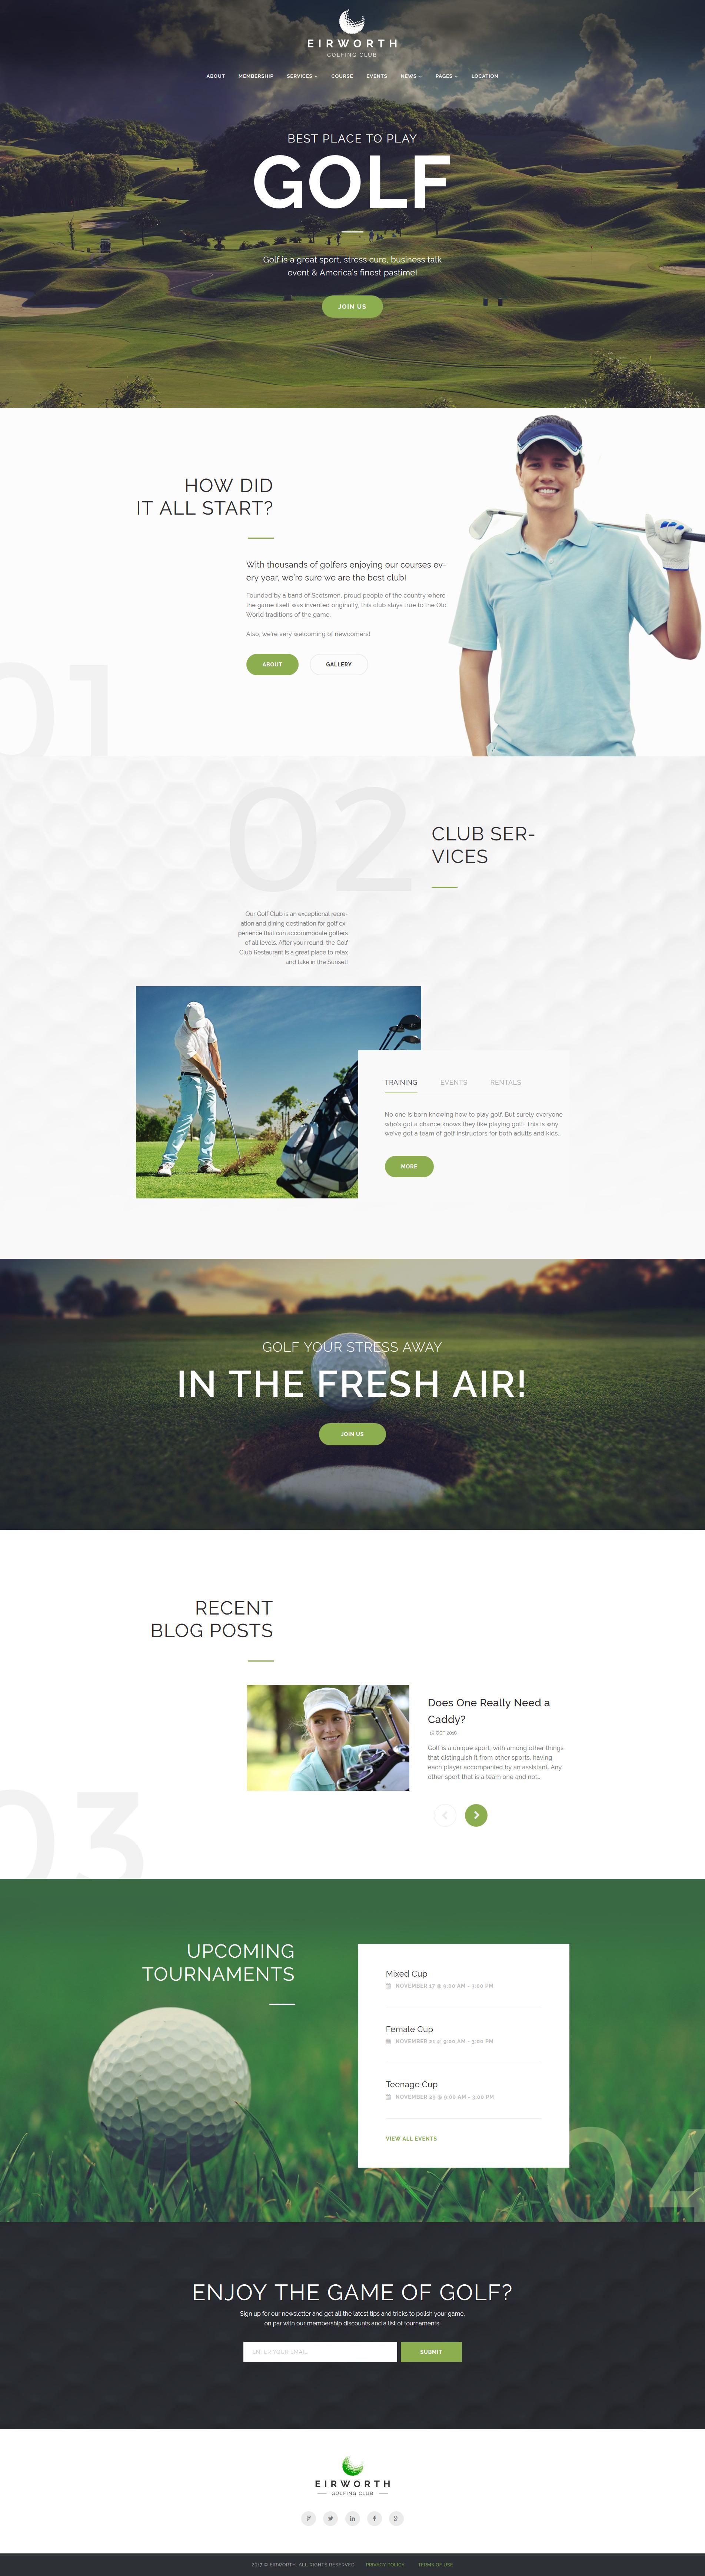 Reszponzív Eirworth - Golfing Club Responsive WordPress sablon 63966